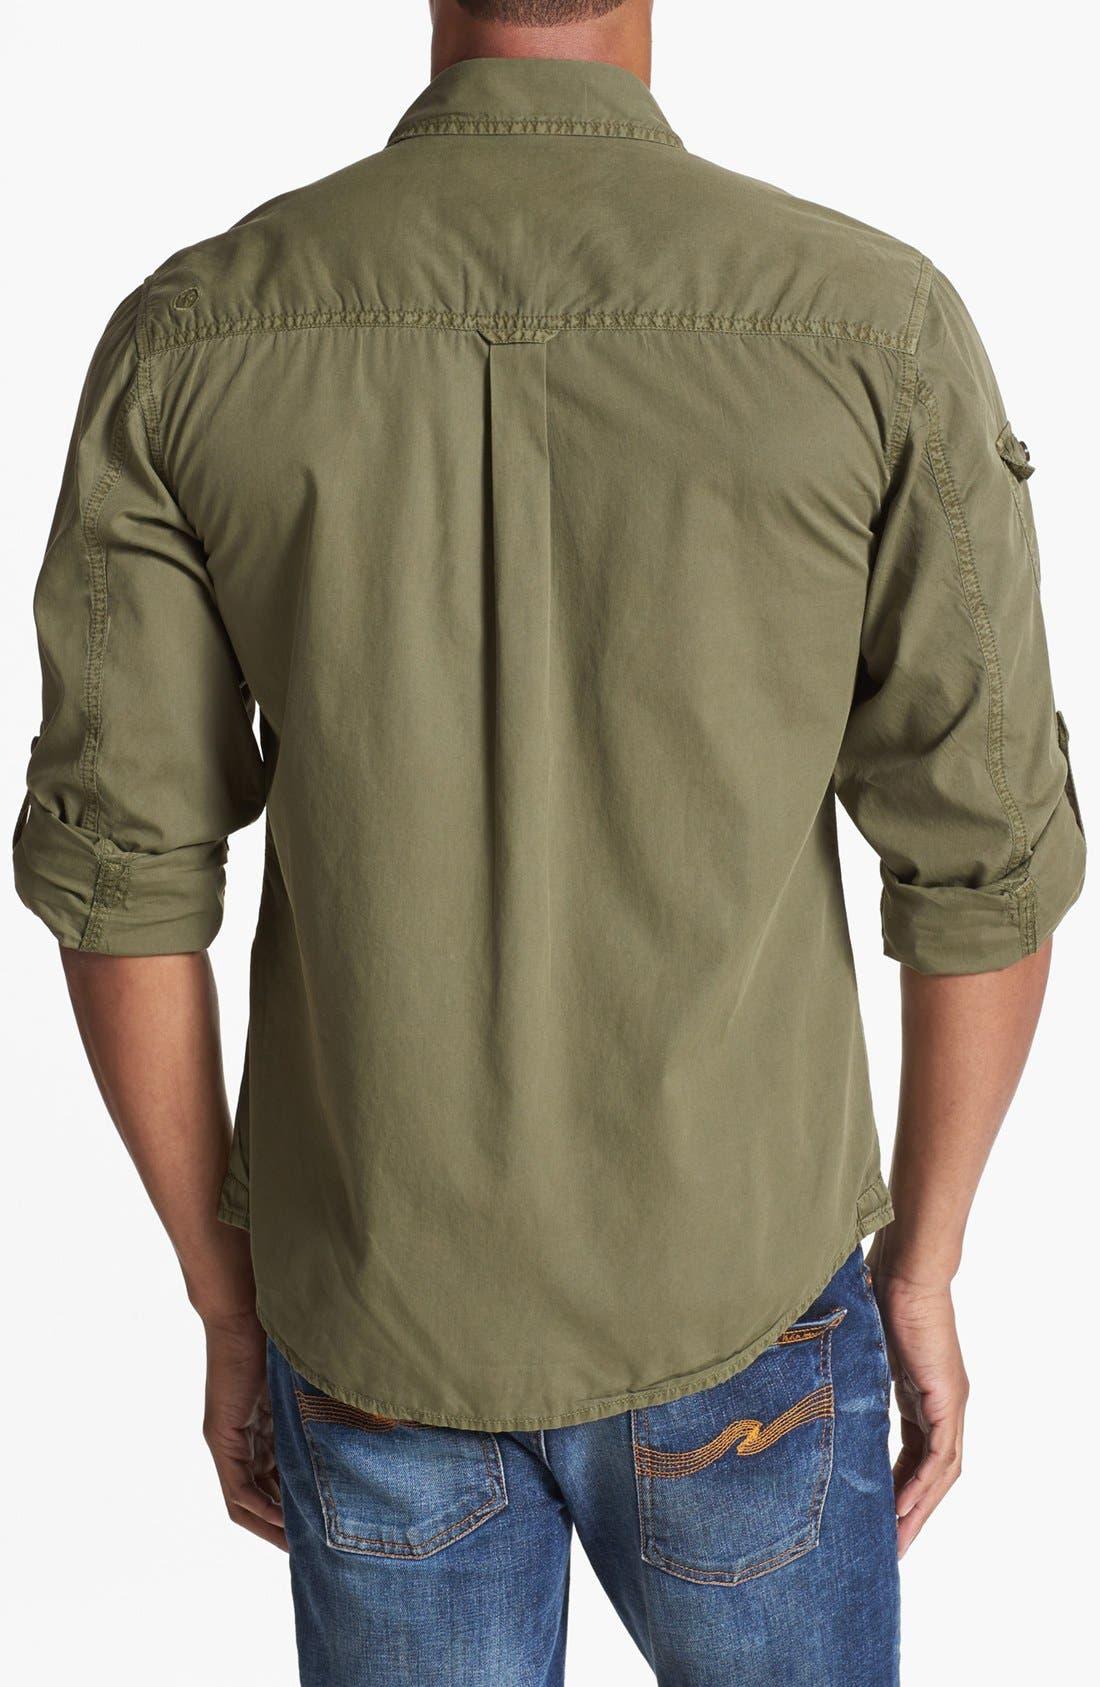 Alternate Image 2  - Tankfarm 'Deploy' Woven Shirt